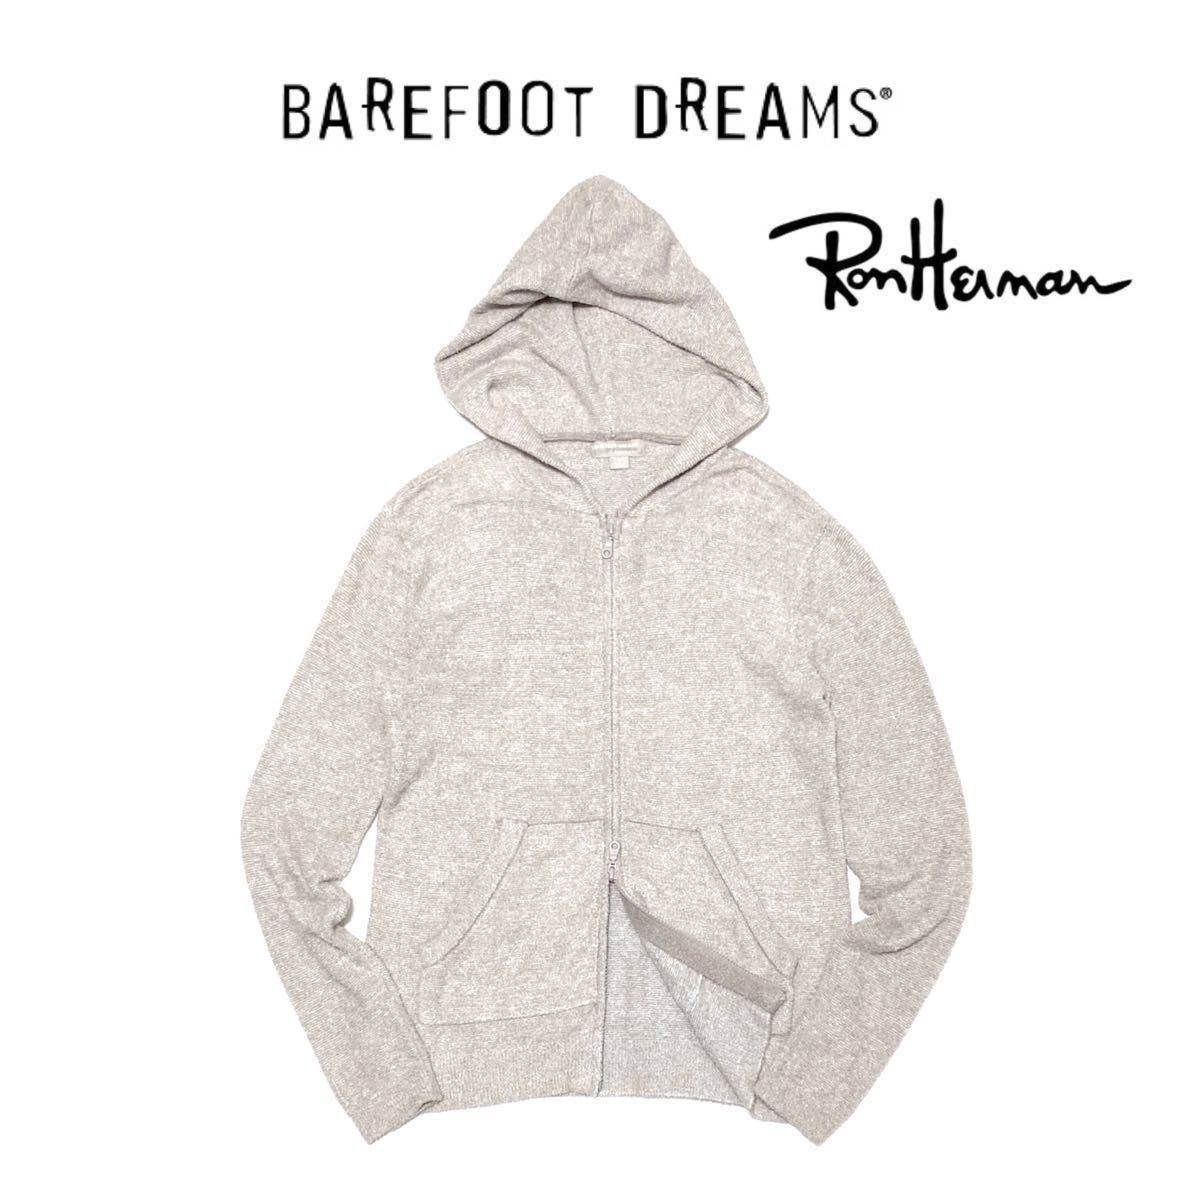 【BAREFOOT DREAMS×RHC】新素材採用のRHC別注モデル最新作◎ベアフットドリームス×ロンハーマン パイルパーカー ダブルジップフーディ_画像2